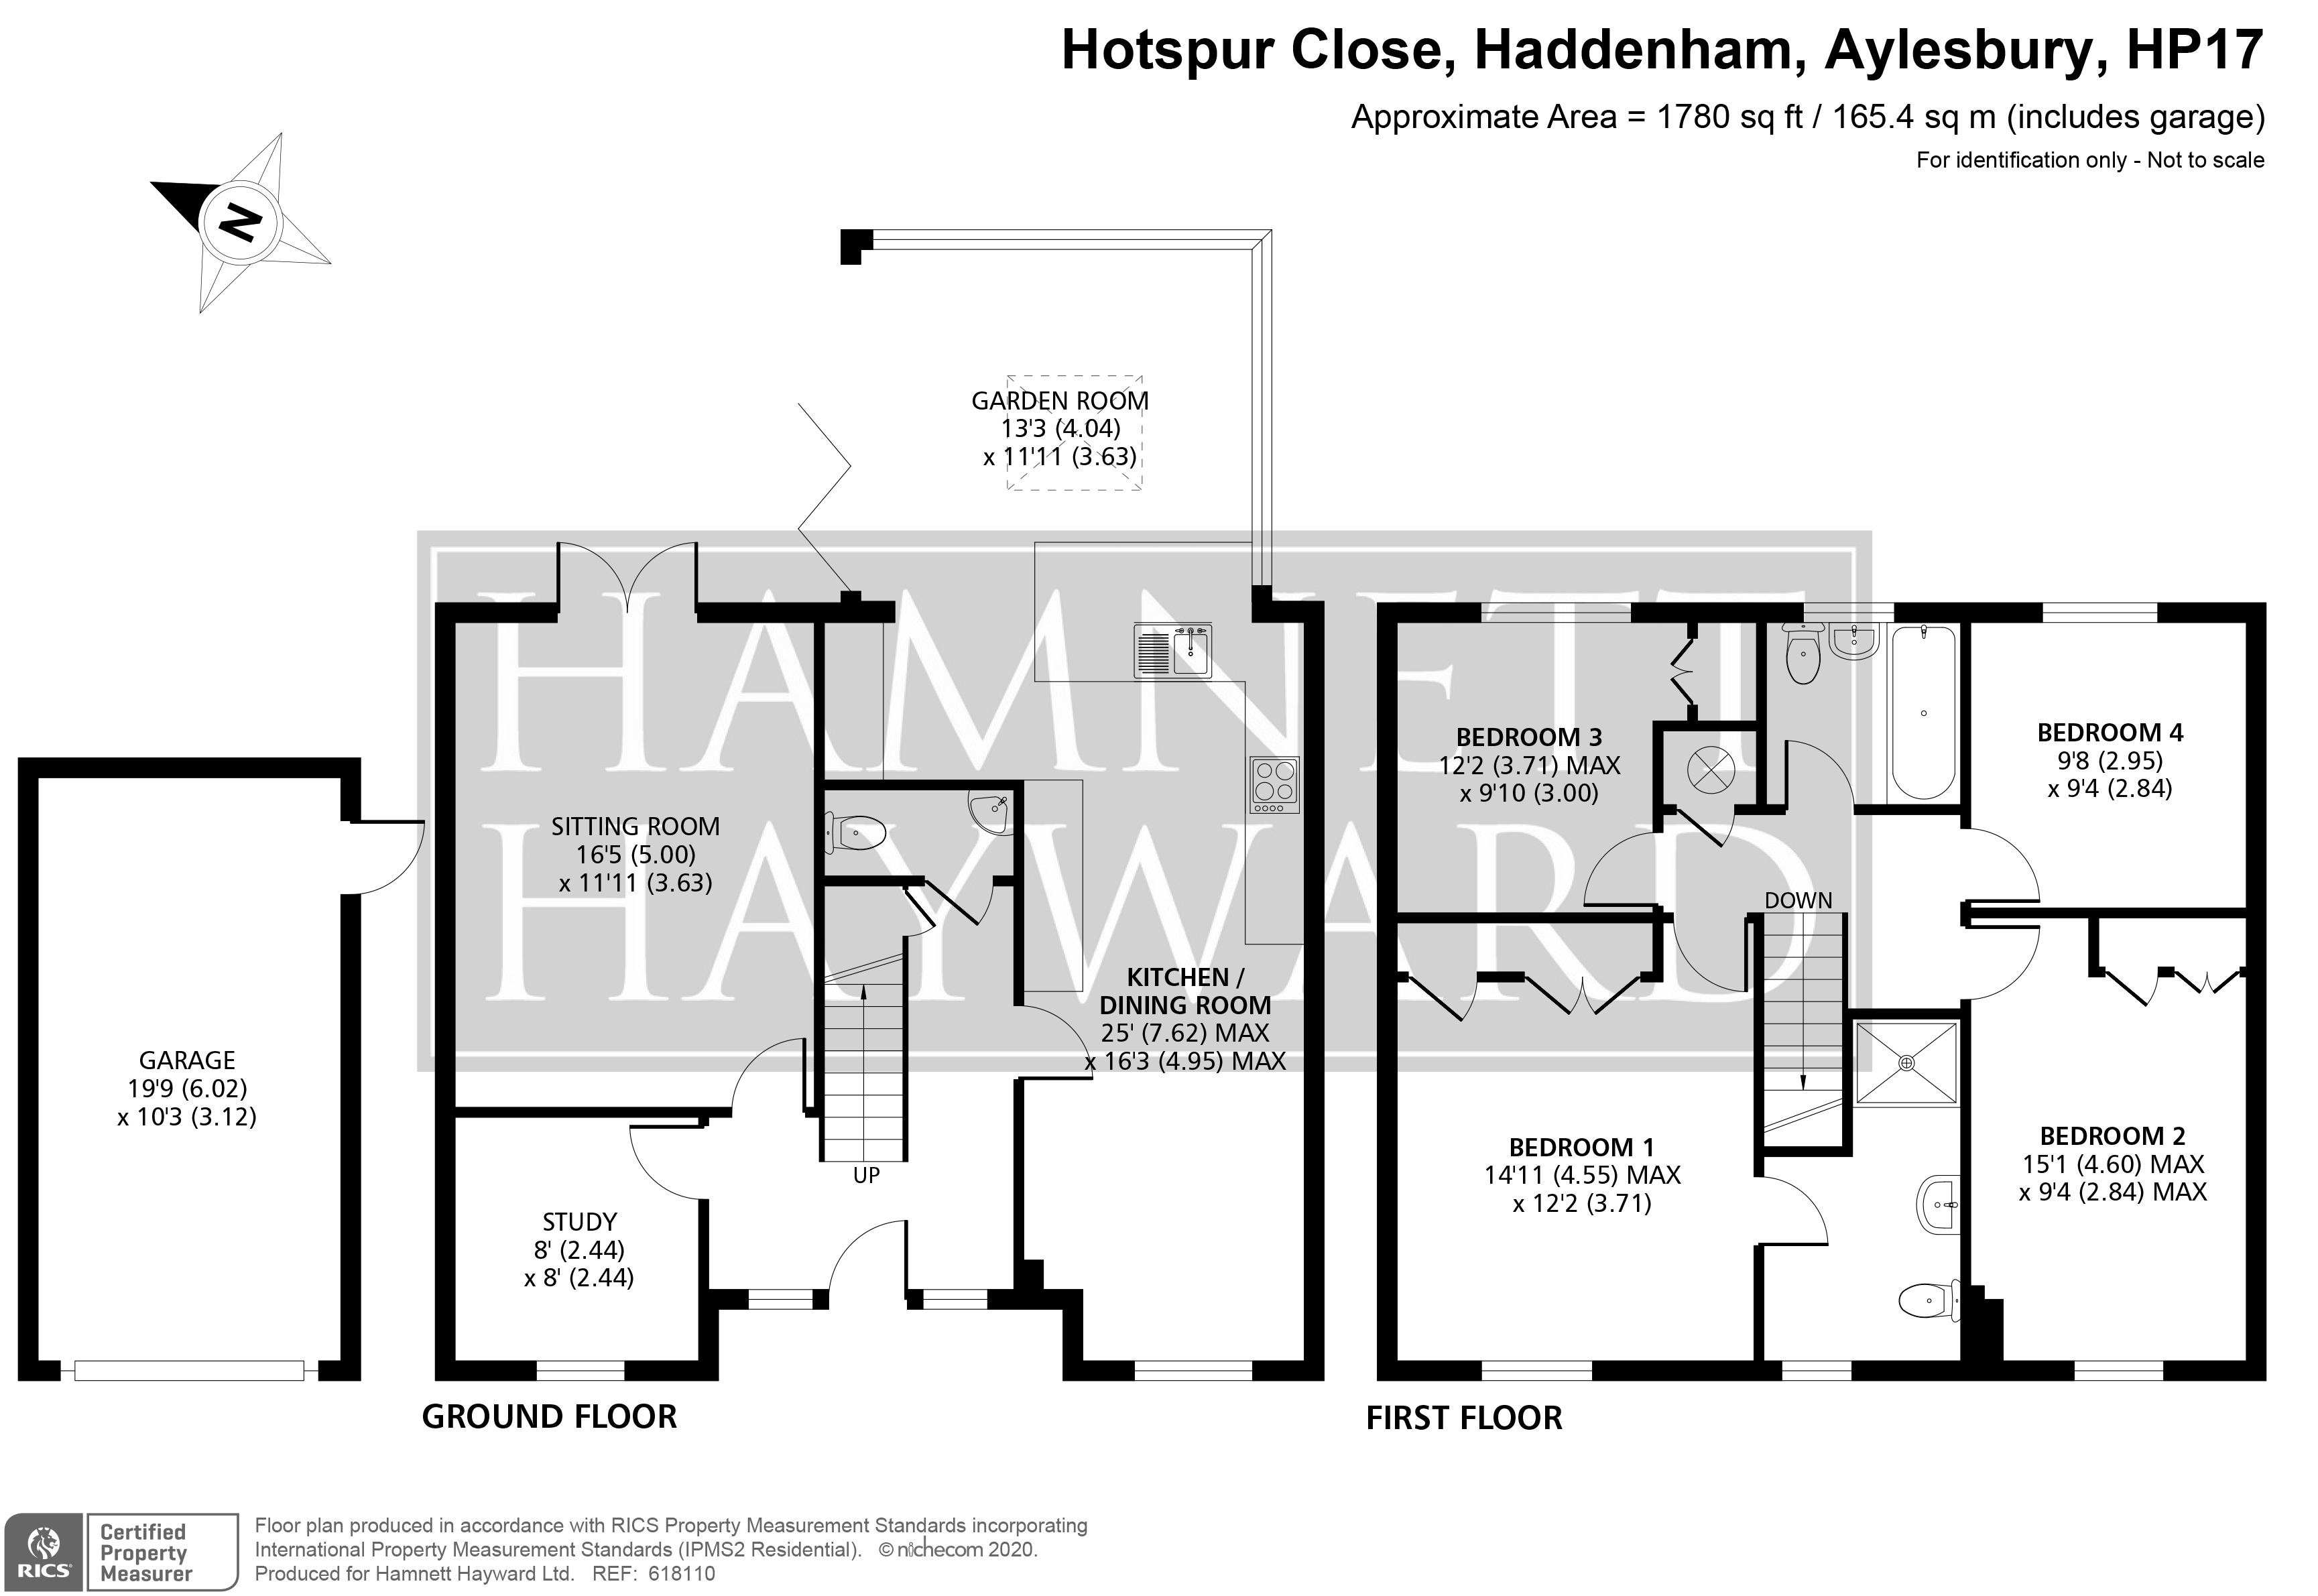 Haddenham Haddenham